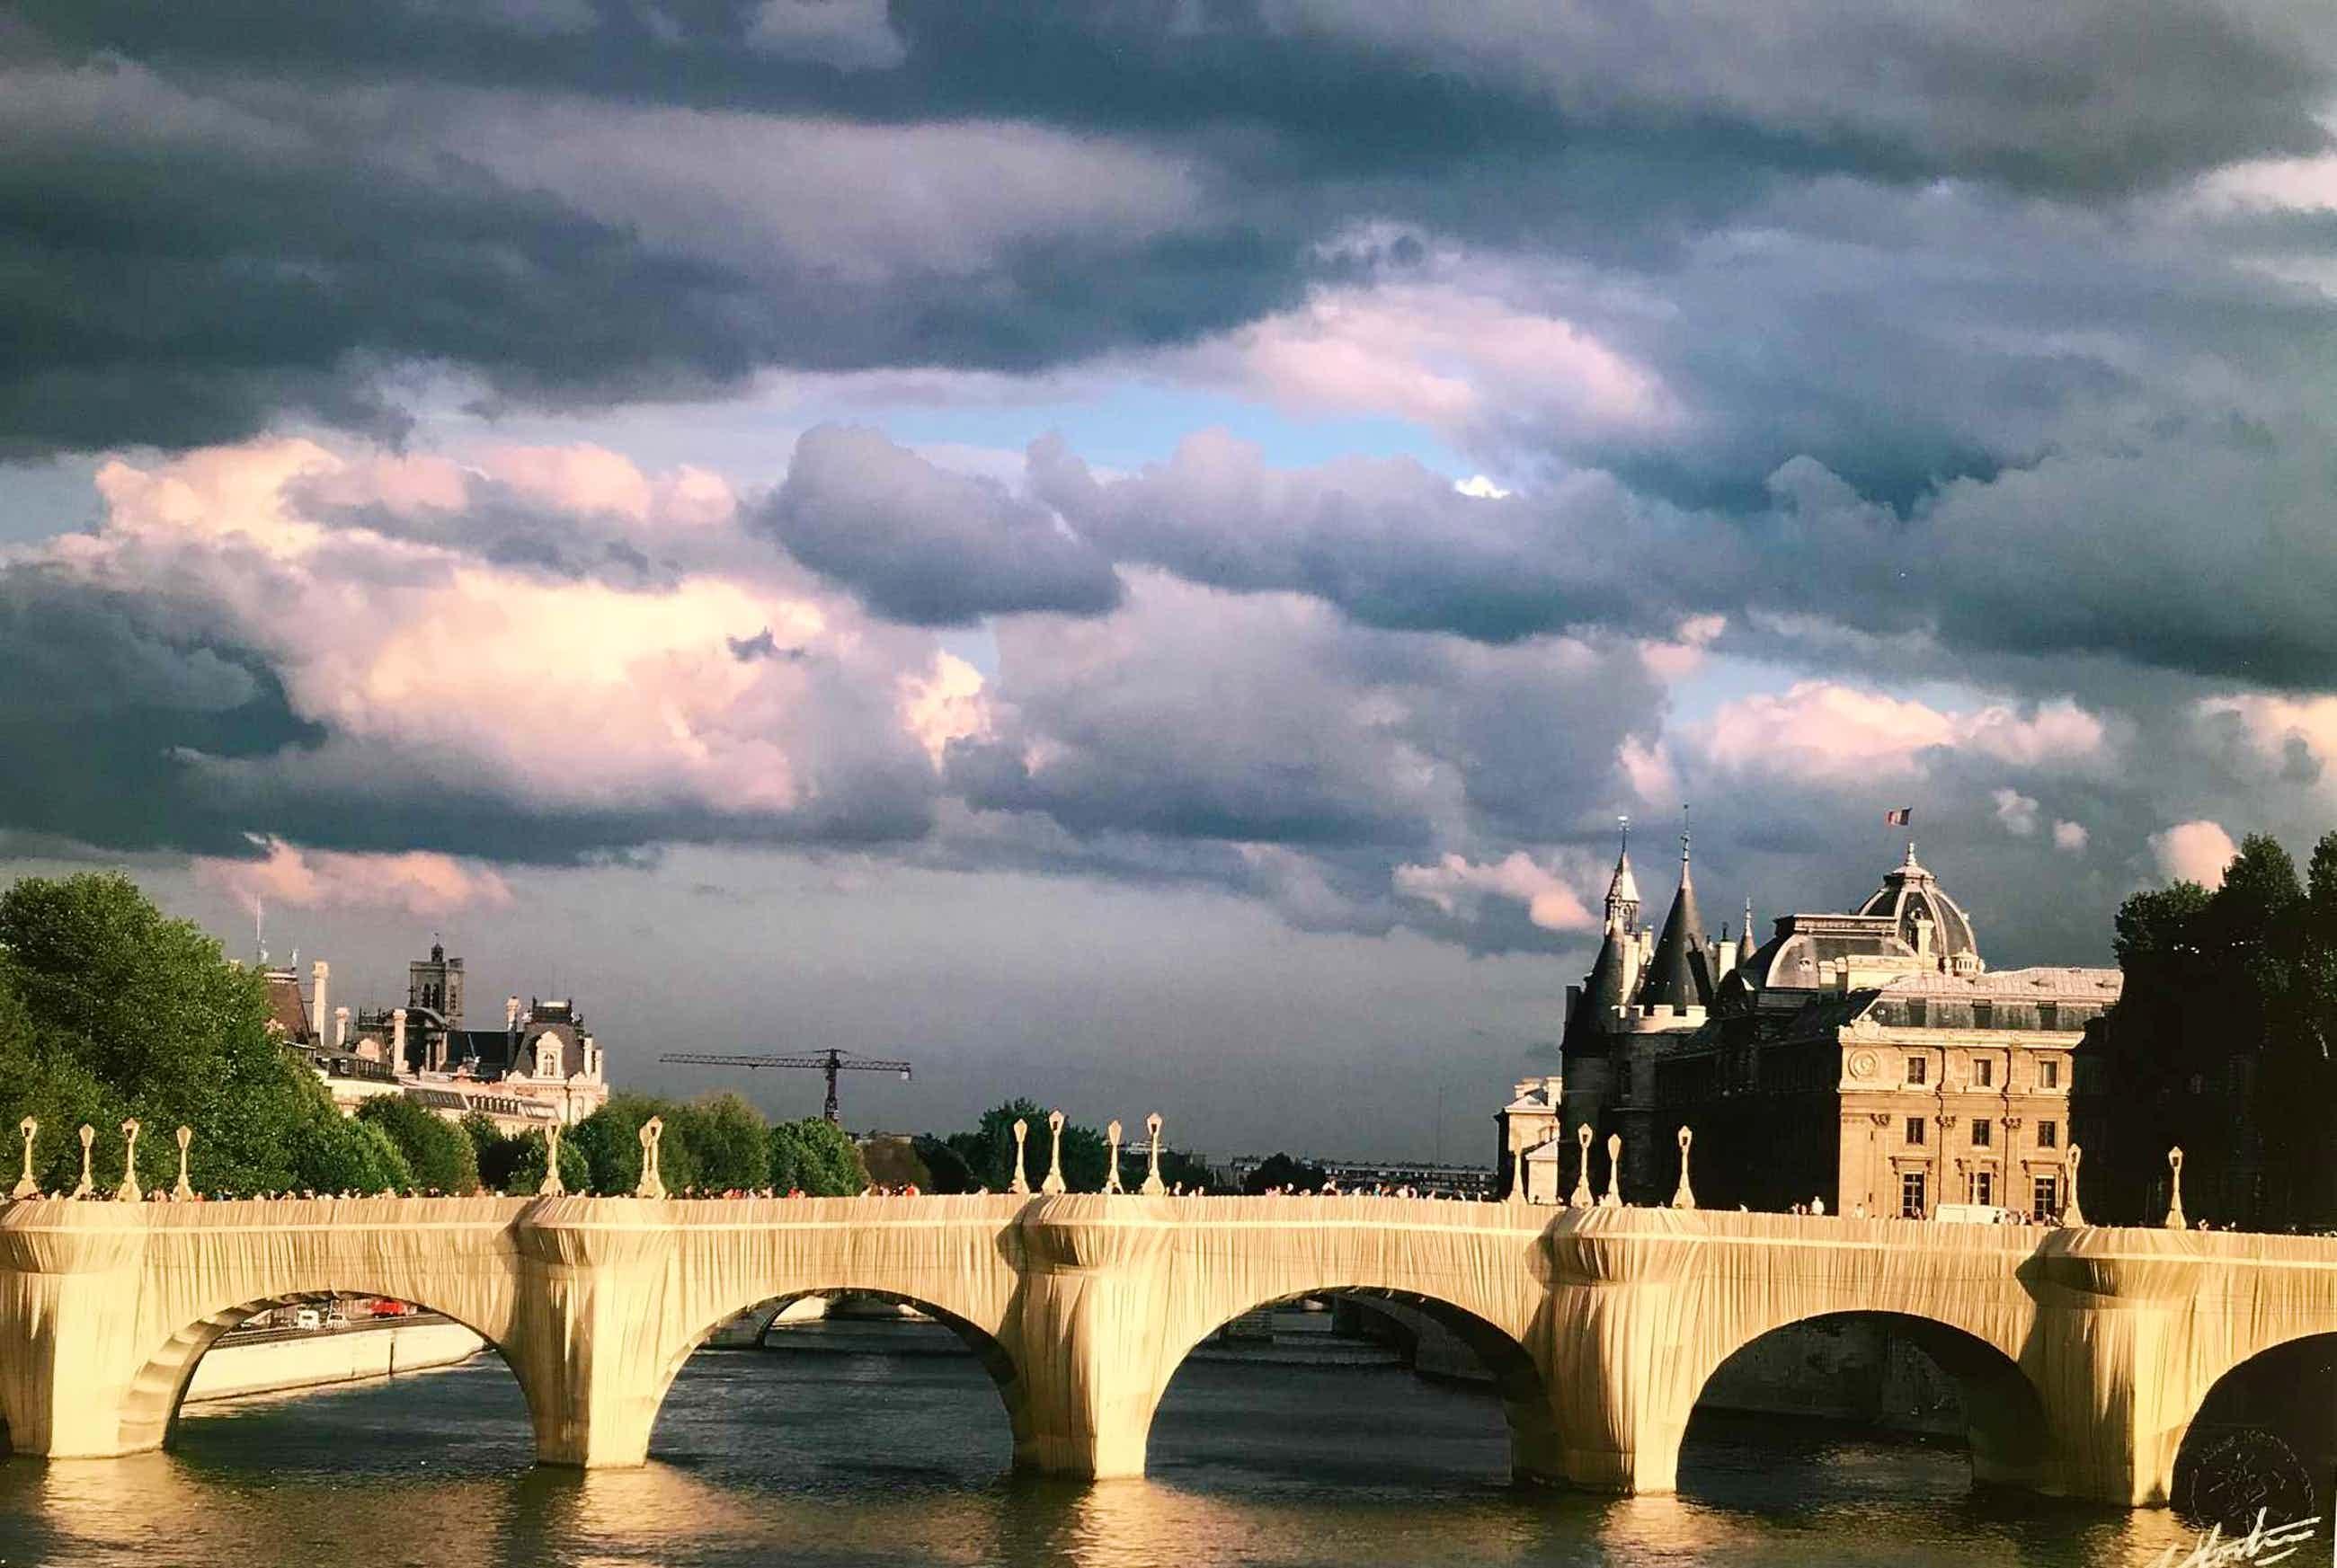 Nico Koster - Christo Pont Neuf Parijs 1985 kopen? Bied vanaf 100!